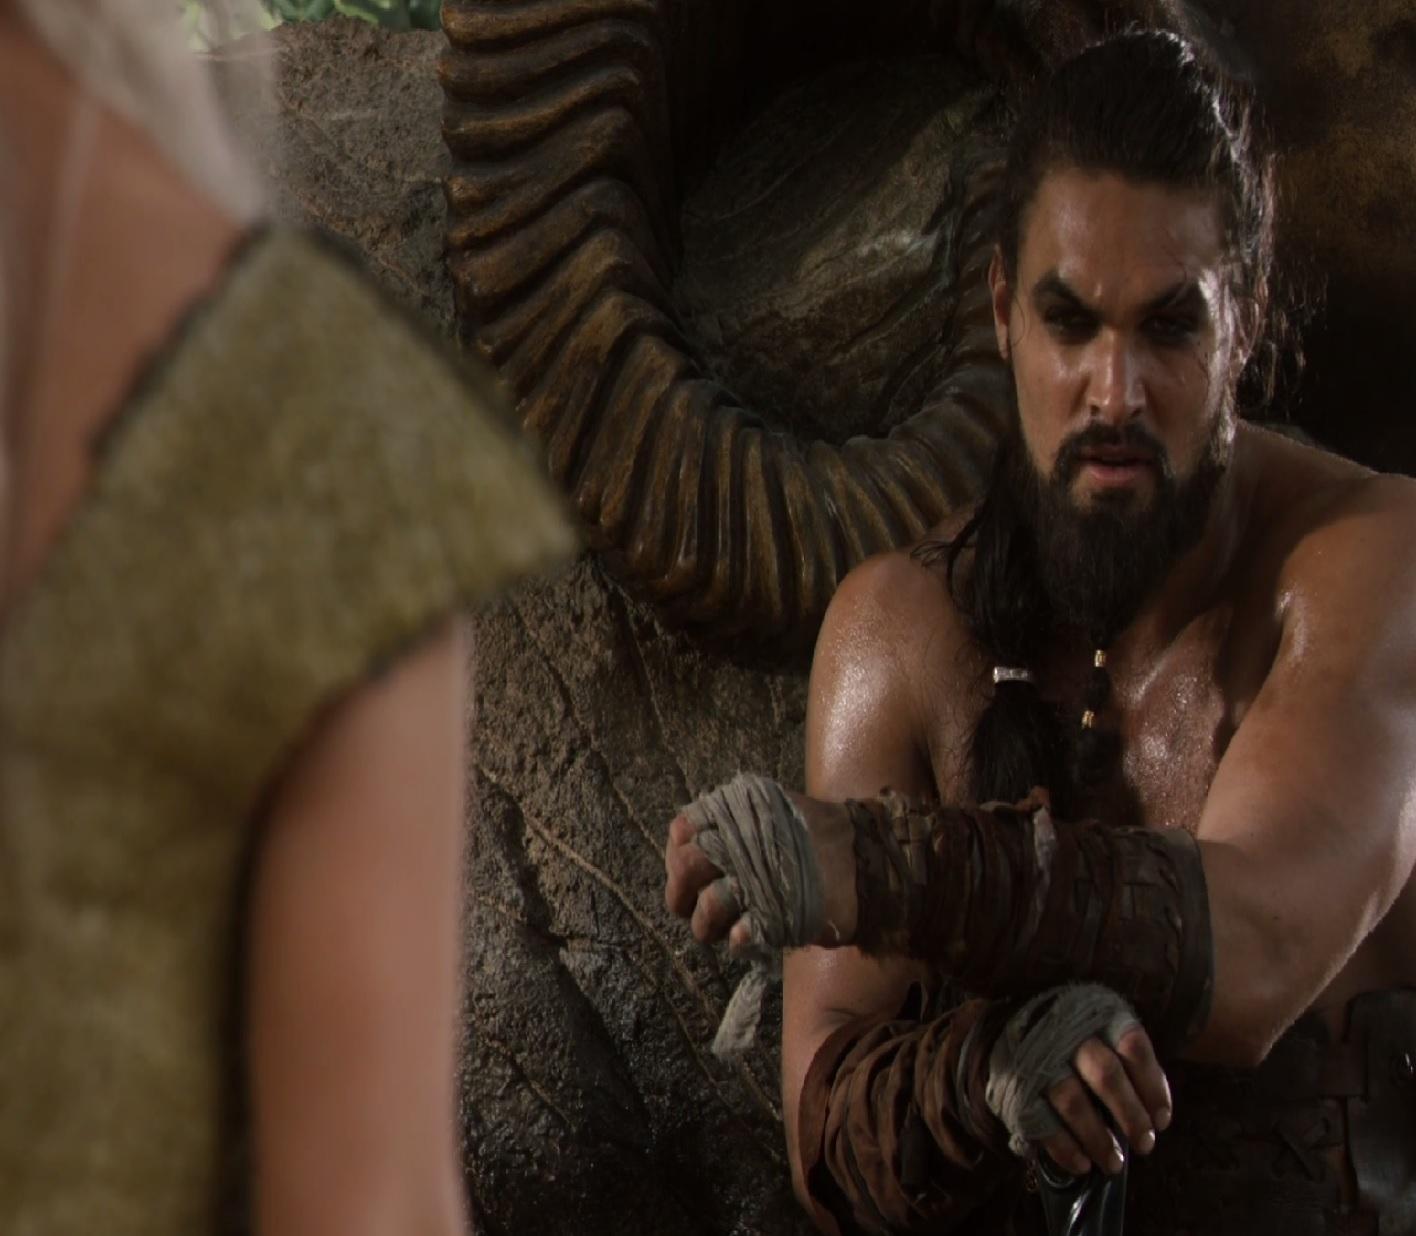 Jason Momoa Languages: Neko Random: Things I Like: Khal Drogo (Game Of Thrones